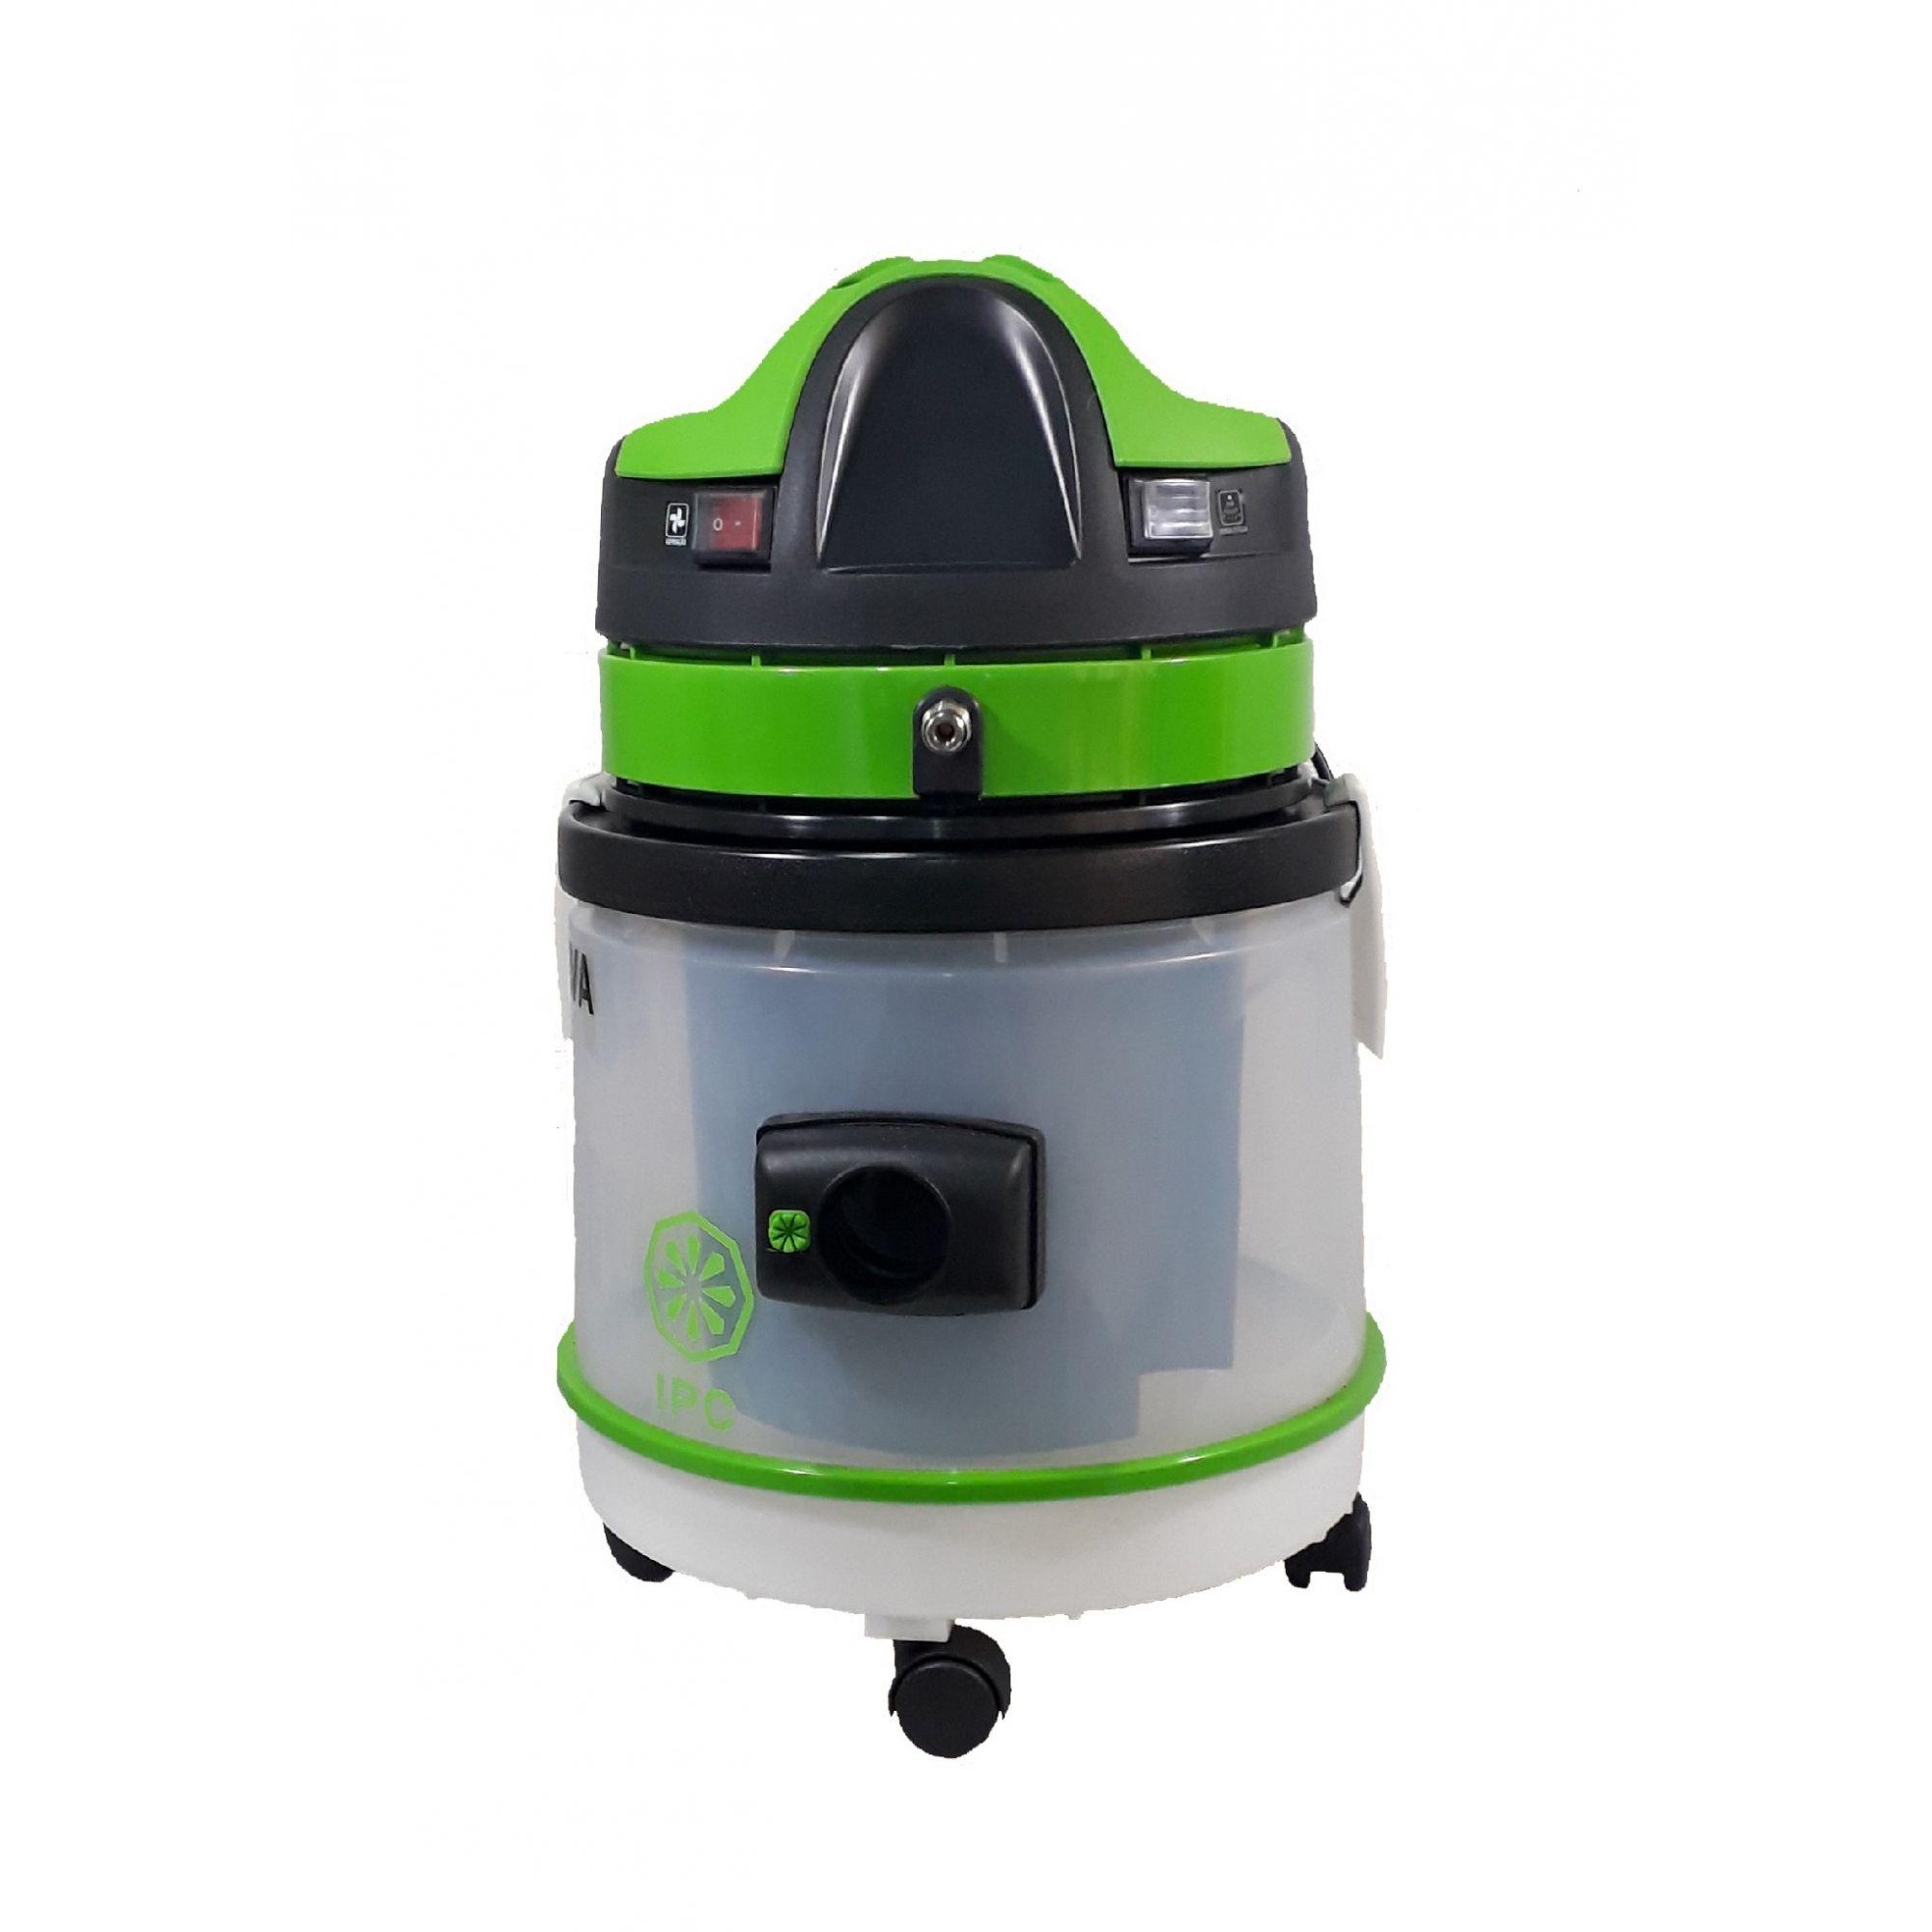 Lavadora Extratora IPC Lava Pro Cristal Profissional Potente  - Tempo de Casa